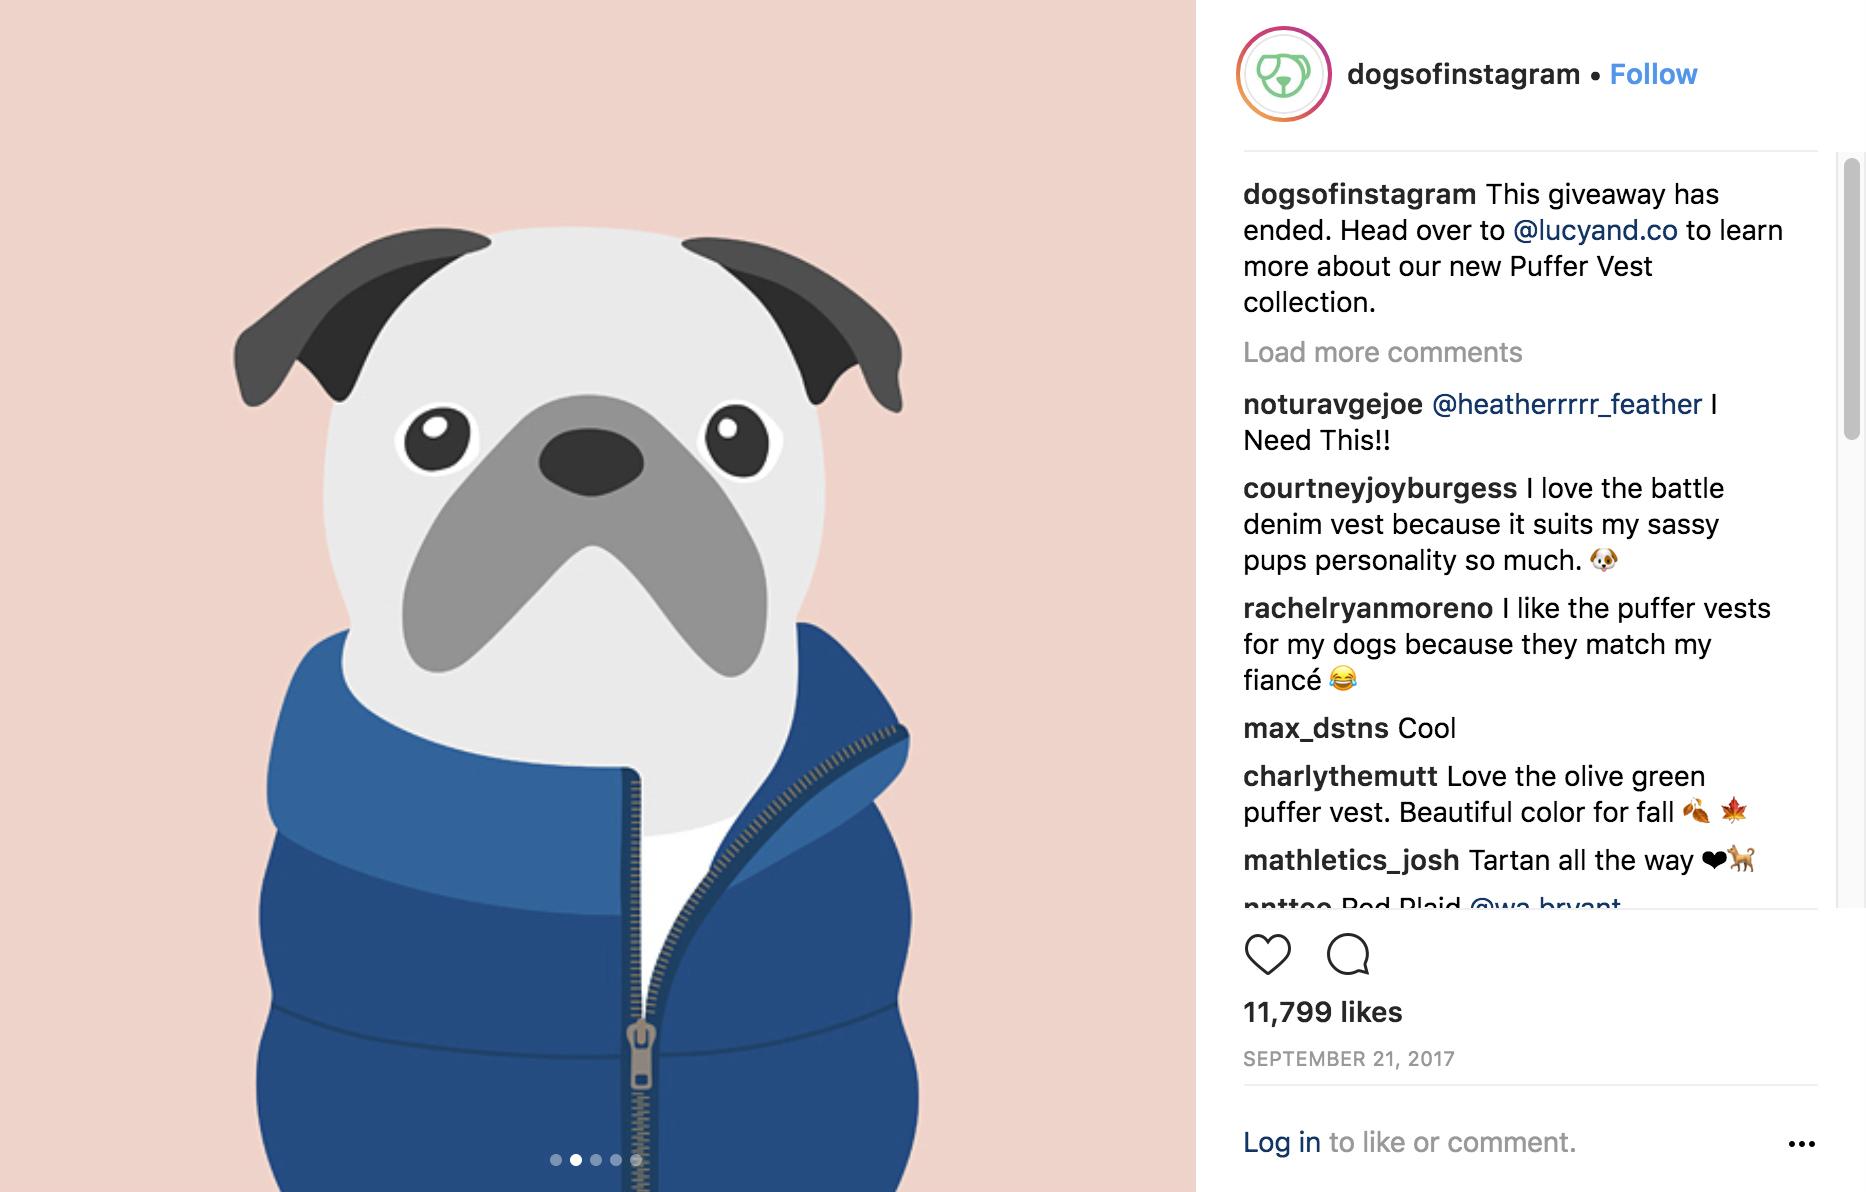 woofmodels-dogsofinstagram-lucynco-instagram.jpg